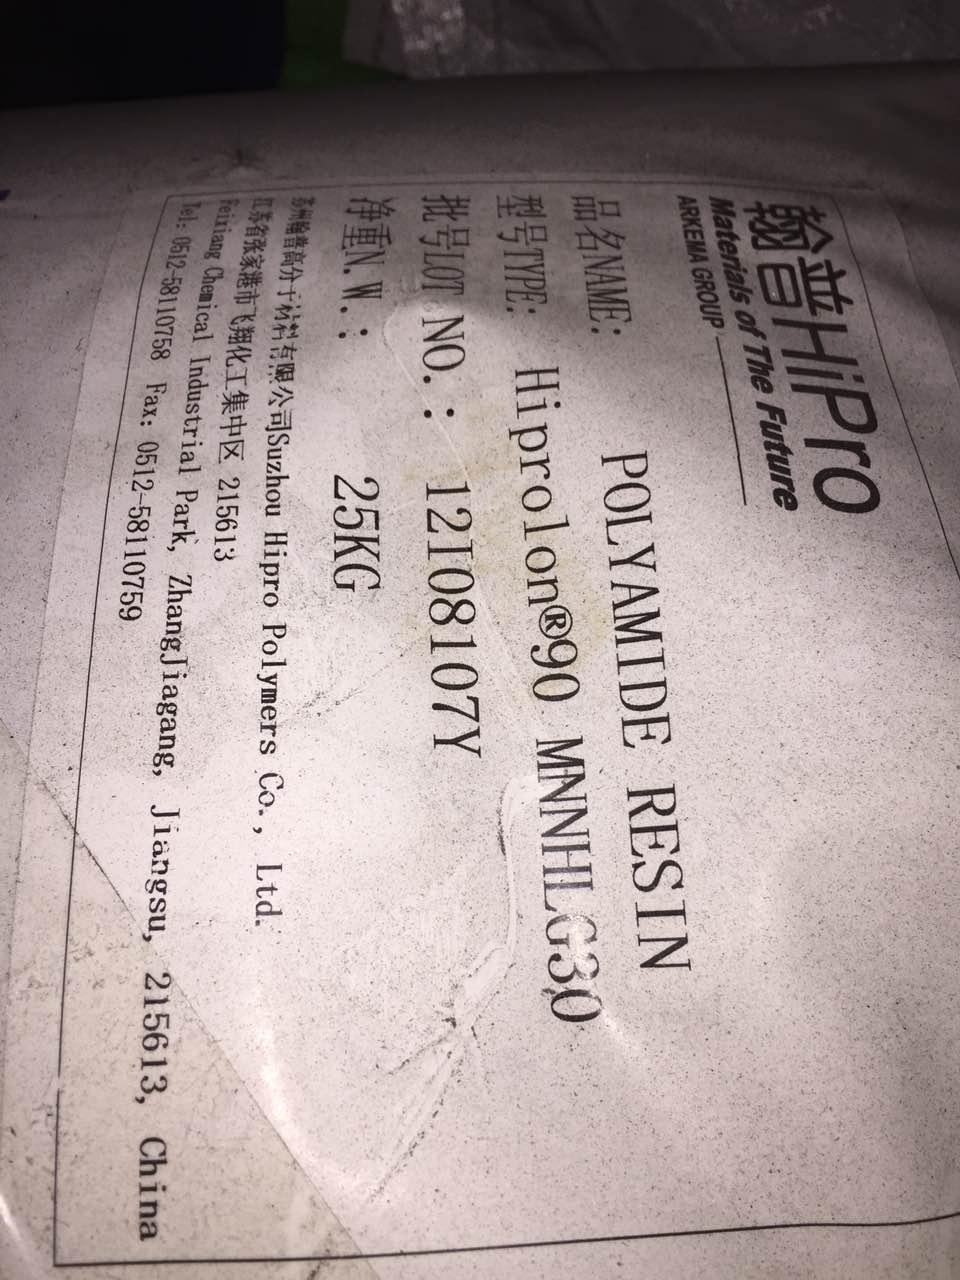 Hiprolon 90 MNNHL G30 (Nylon 612-GF30)